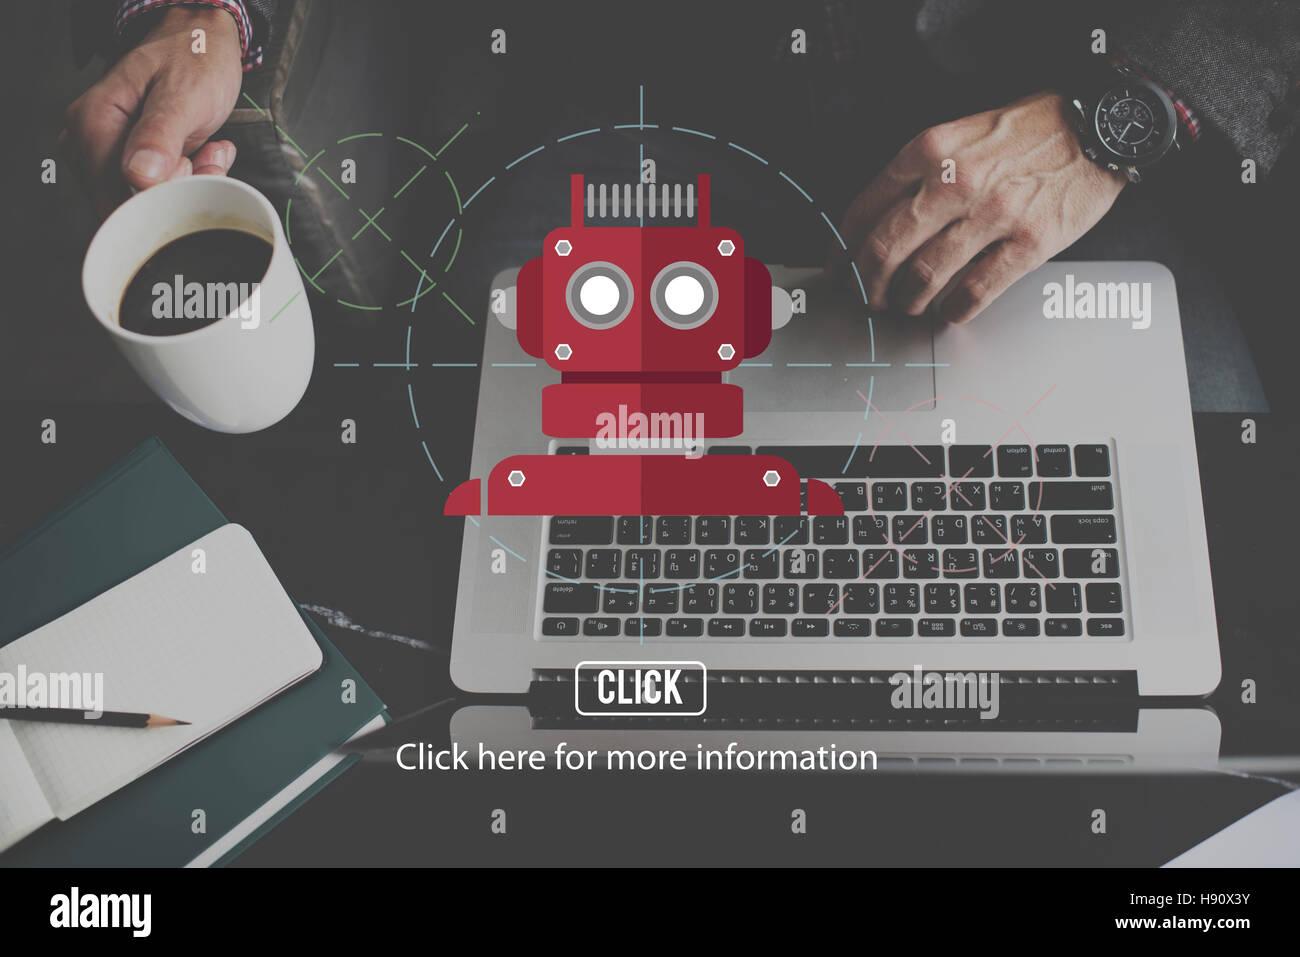 Robot Cyborg Ai Robotics Android Concept Stock Photo 126024975 Alamy